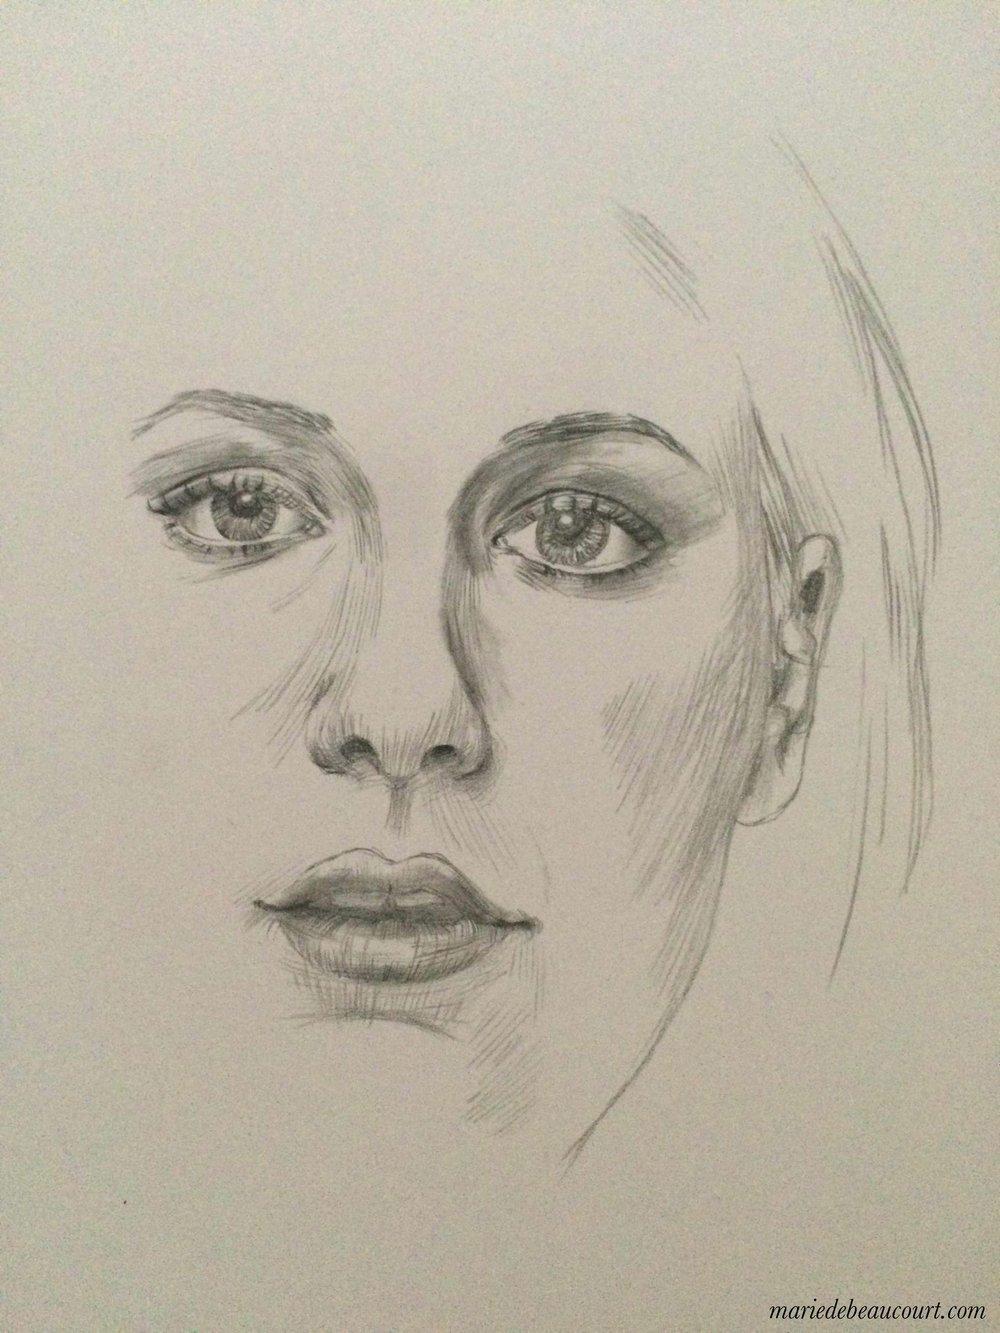 marie-de-beaucourt-illustration-portrait-work-in-progress-6.jpg